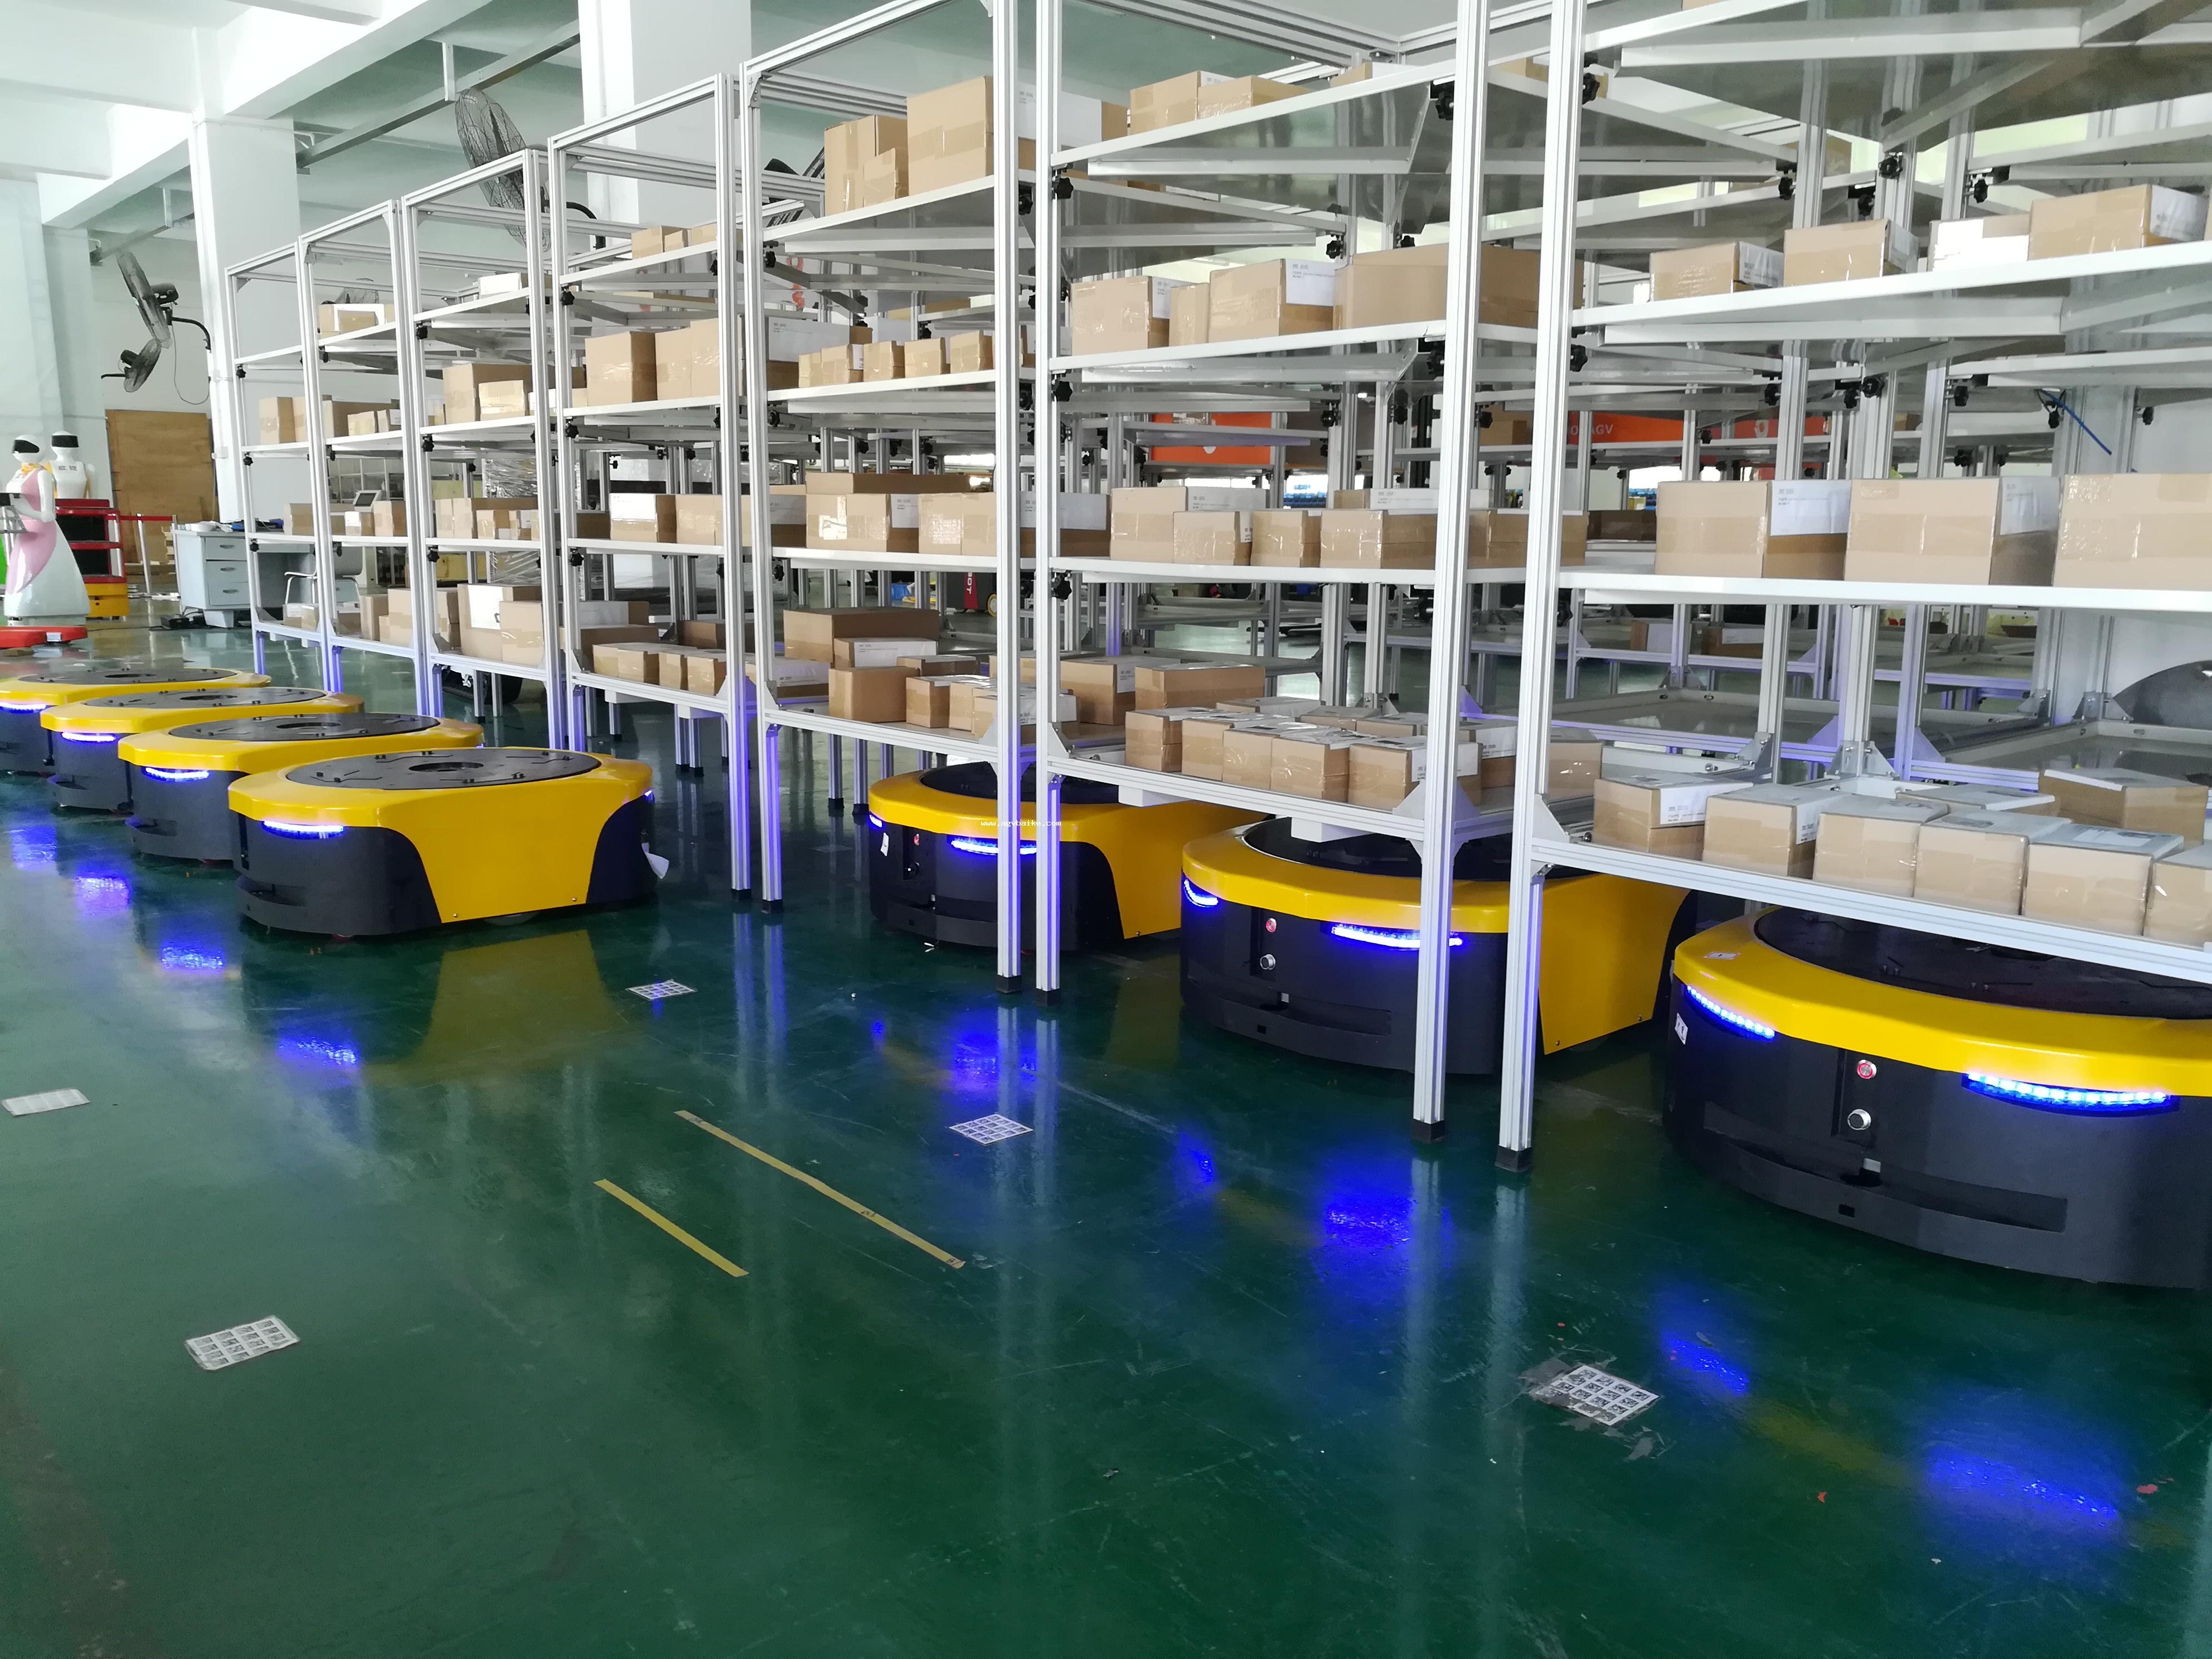 AGV仓库和传统库房相比有哪些优点